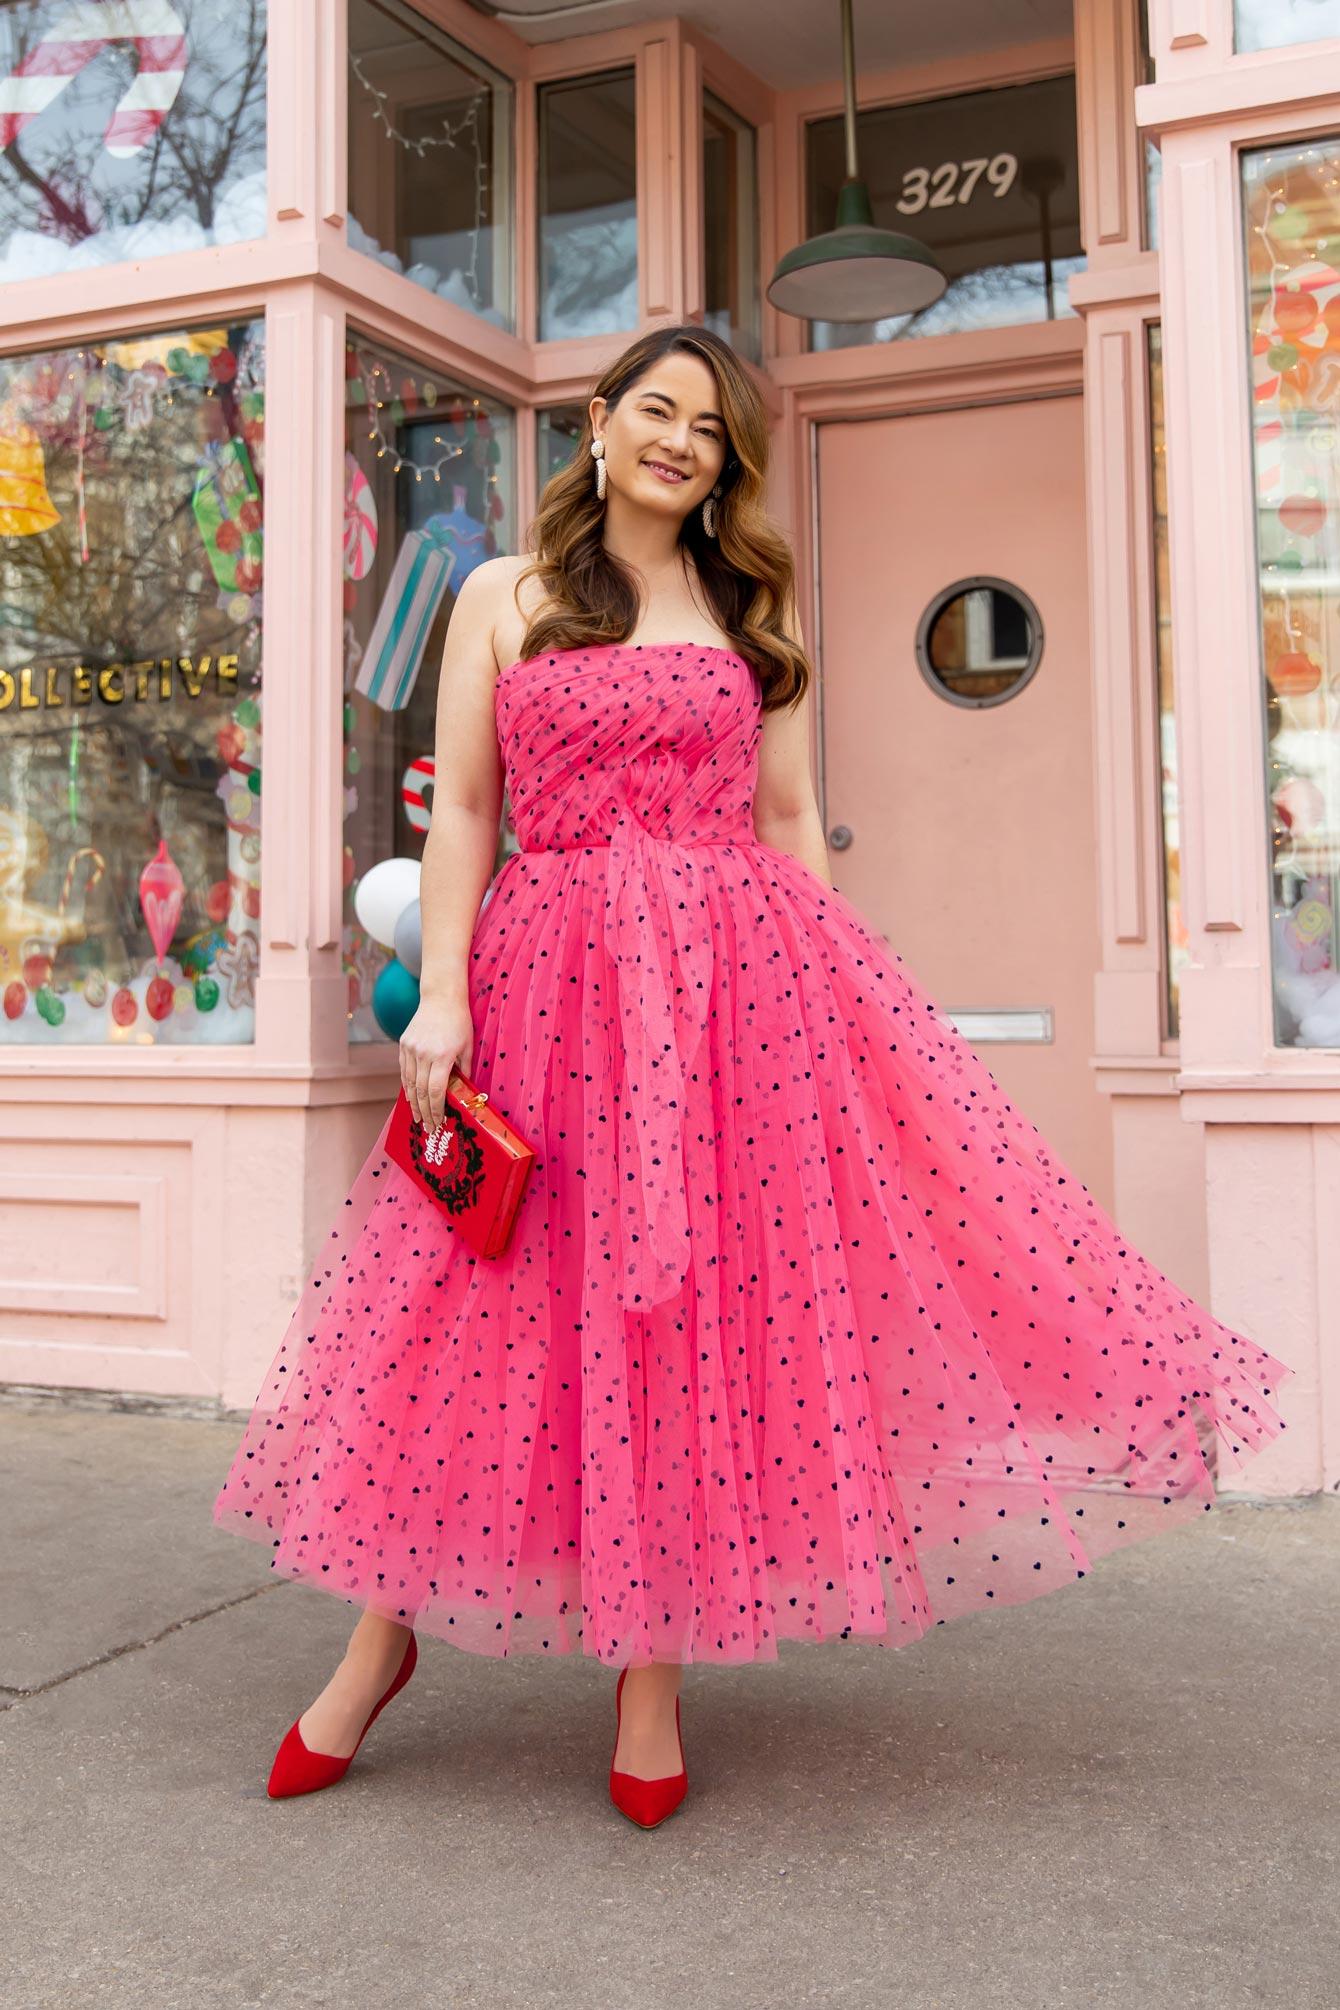 Carolina Herrera Heart Polka Dot Pink Dress